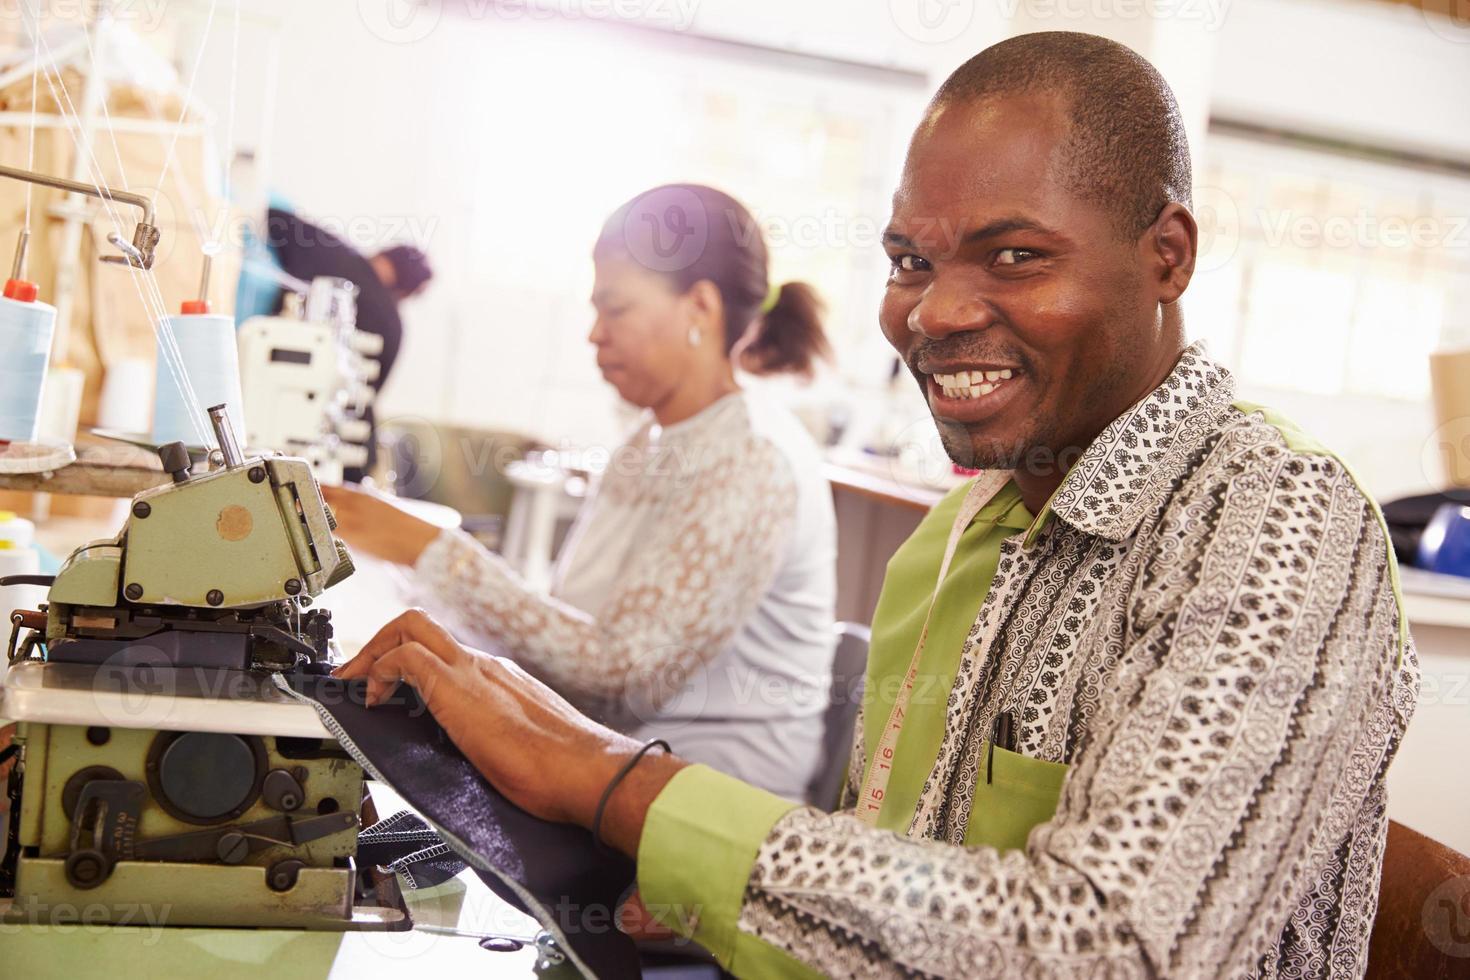 leende man som sy på en community workshop, Sydafrika foto